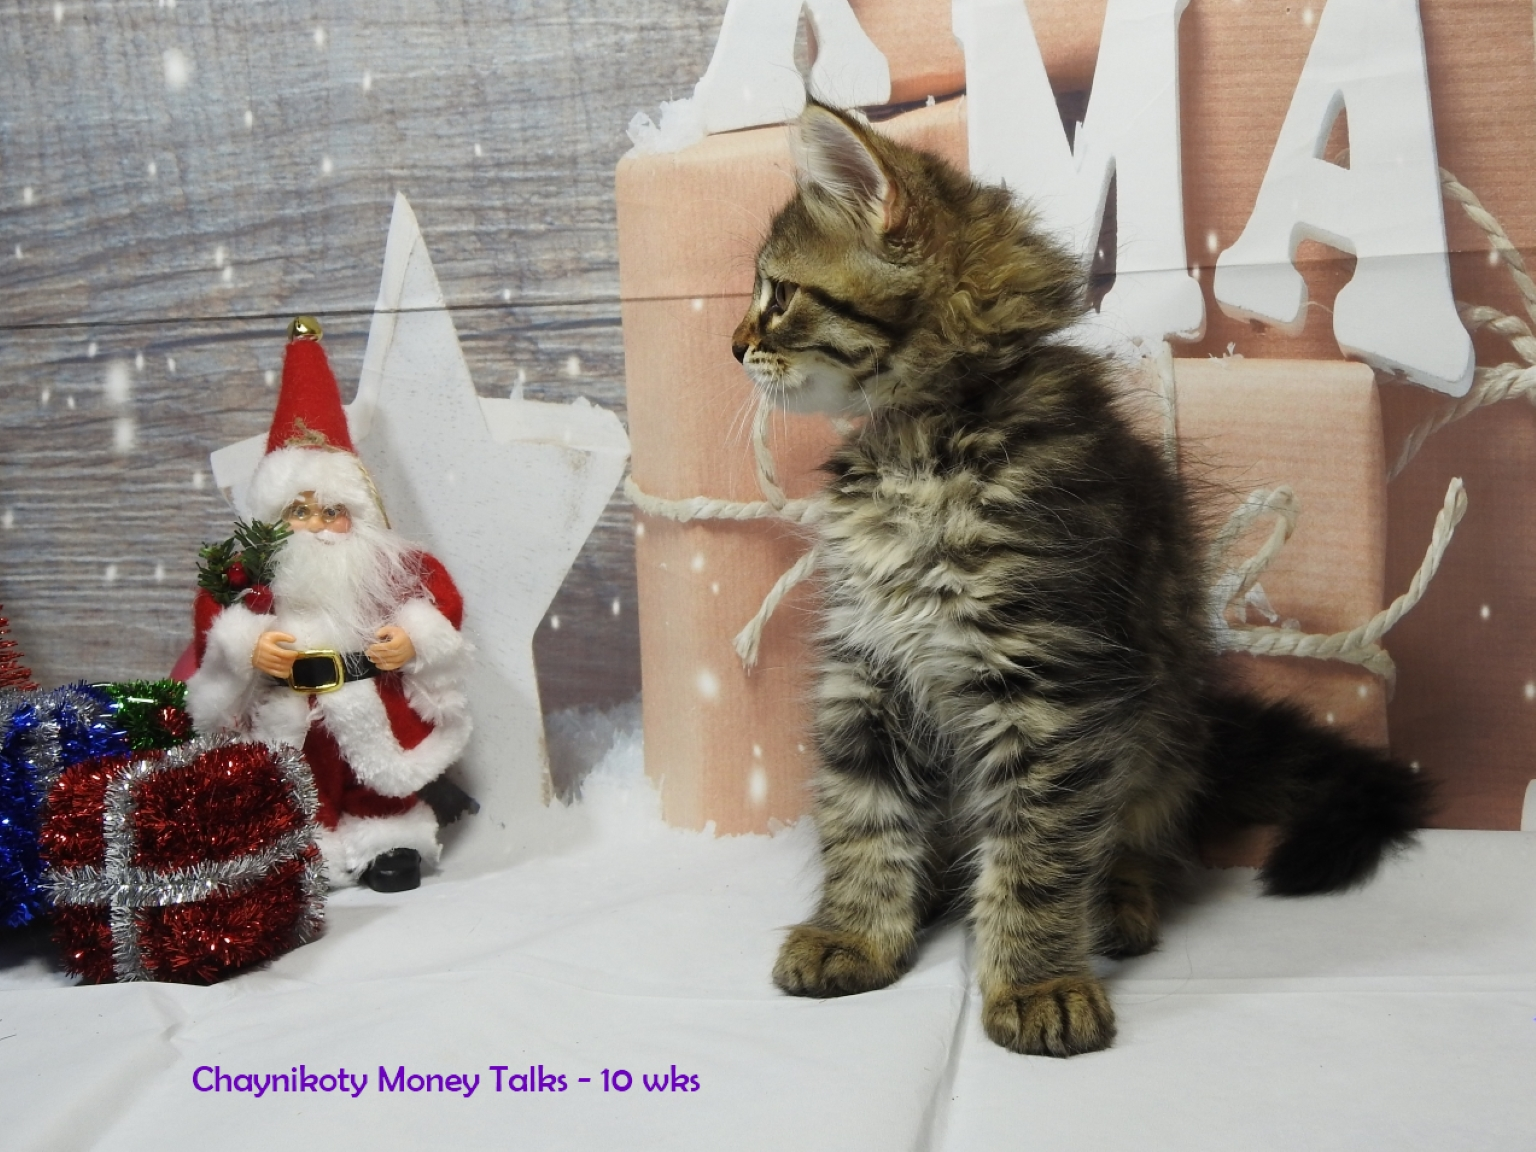 Chaynikoty Money Talks